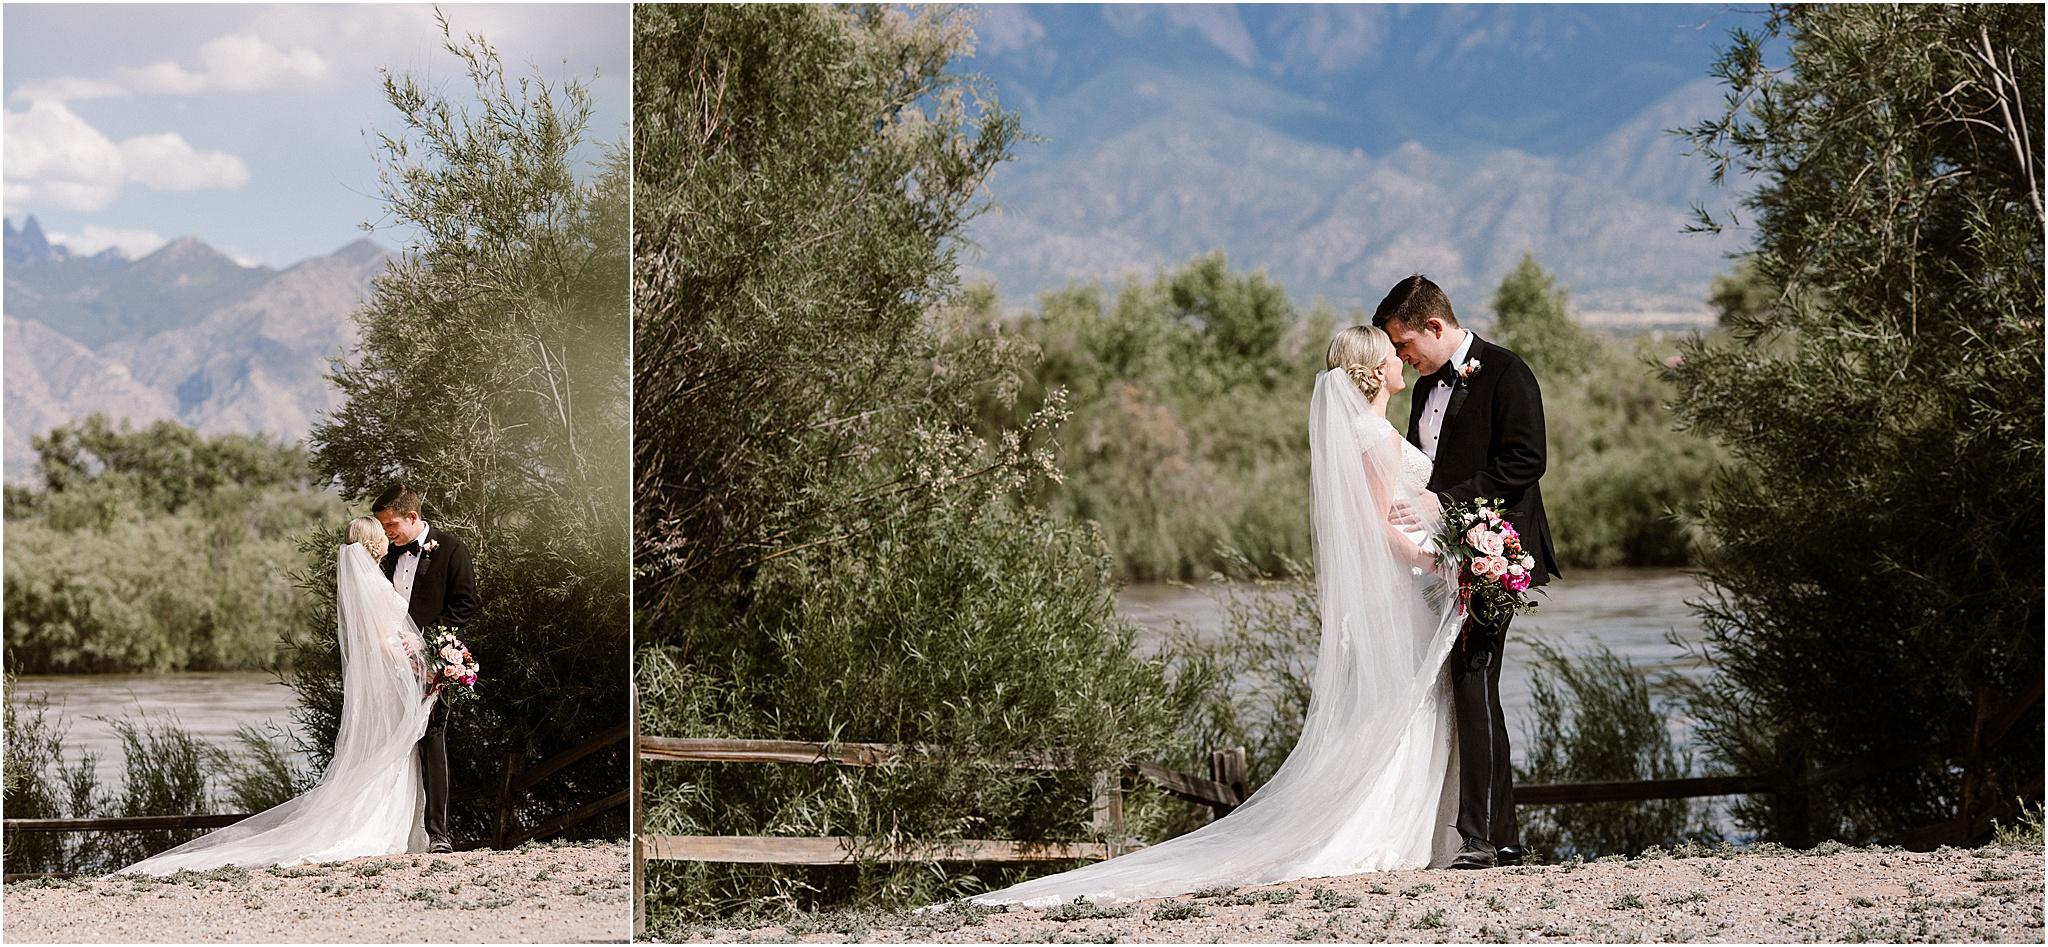 JENNA_JEROME_BLUE ROSE PHOTOGRAPHY_ABQ WEDDING_28